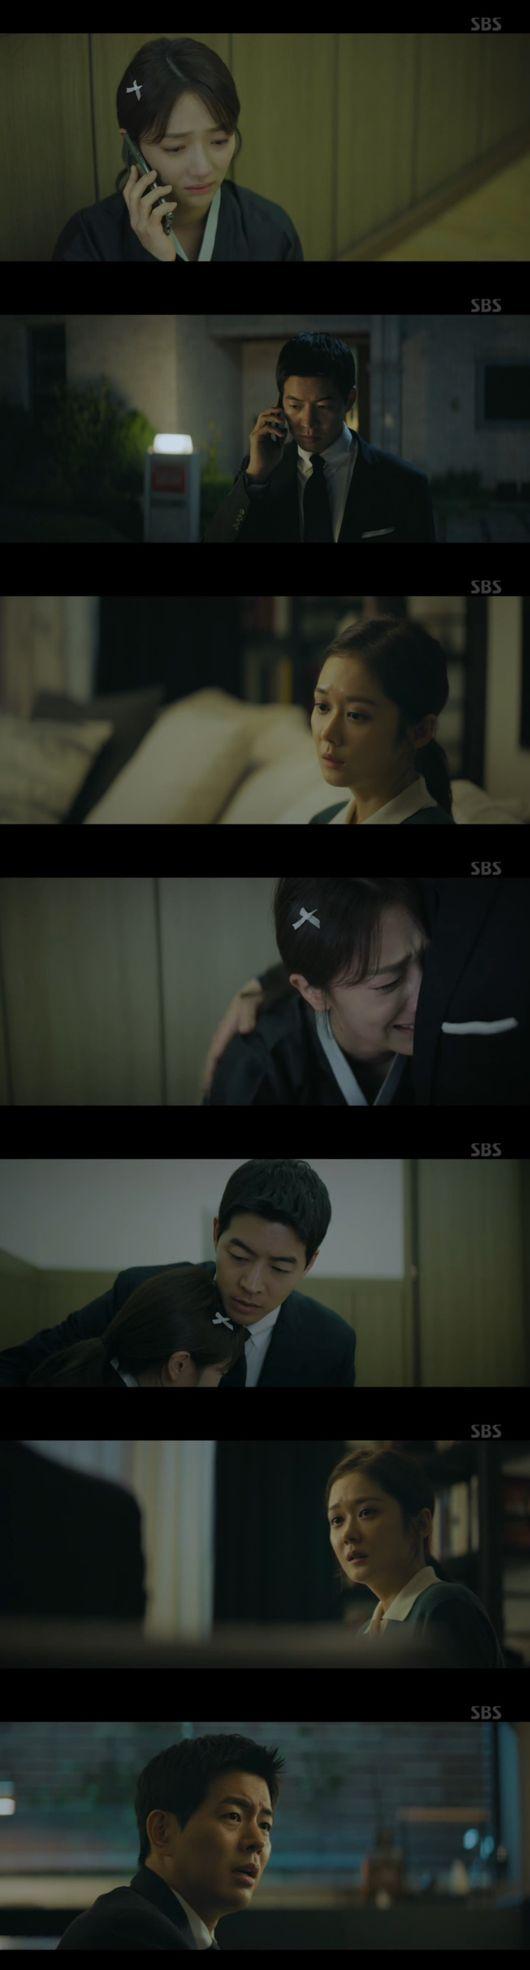 'VIP' 이상윤→표예진 '충격엔딩'‥장나라 ''더 잃을 거 없어'' 폭풍전야 '예고' [어저께TV]